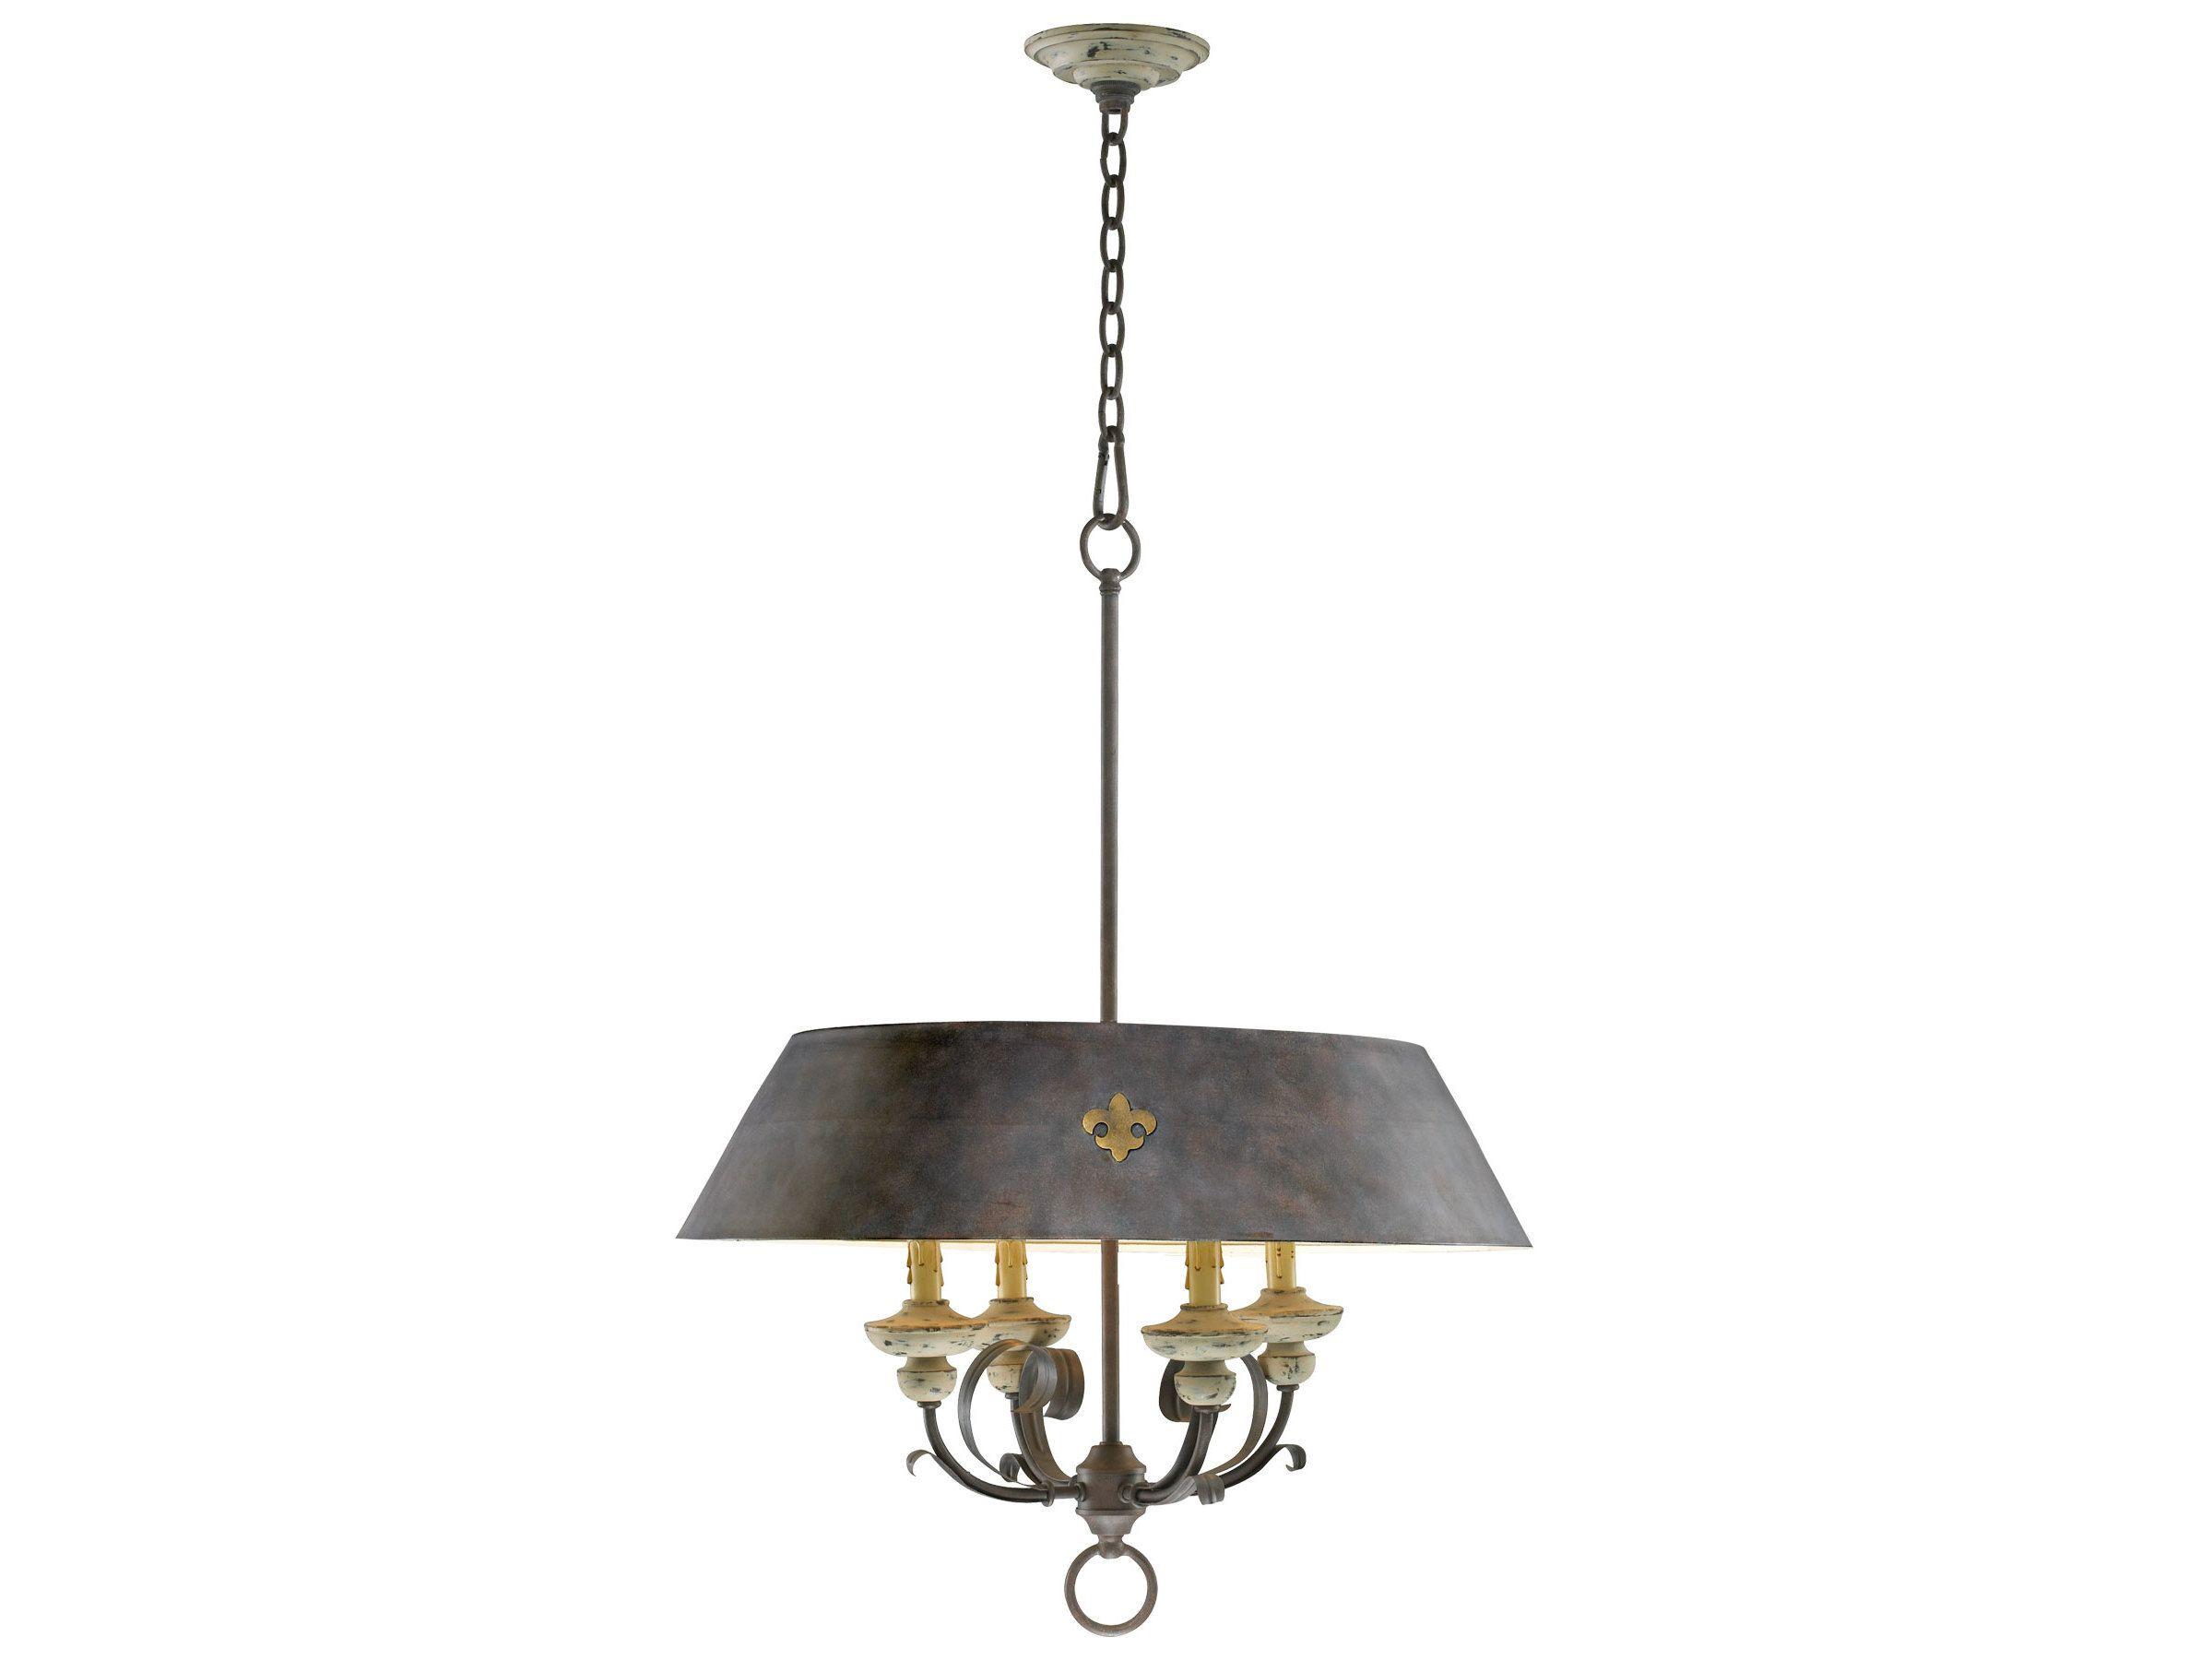 Cyan Design Lighting, Chandeliers, Lamps, Mirrors & Decor